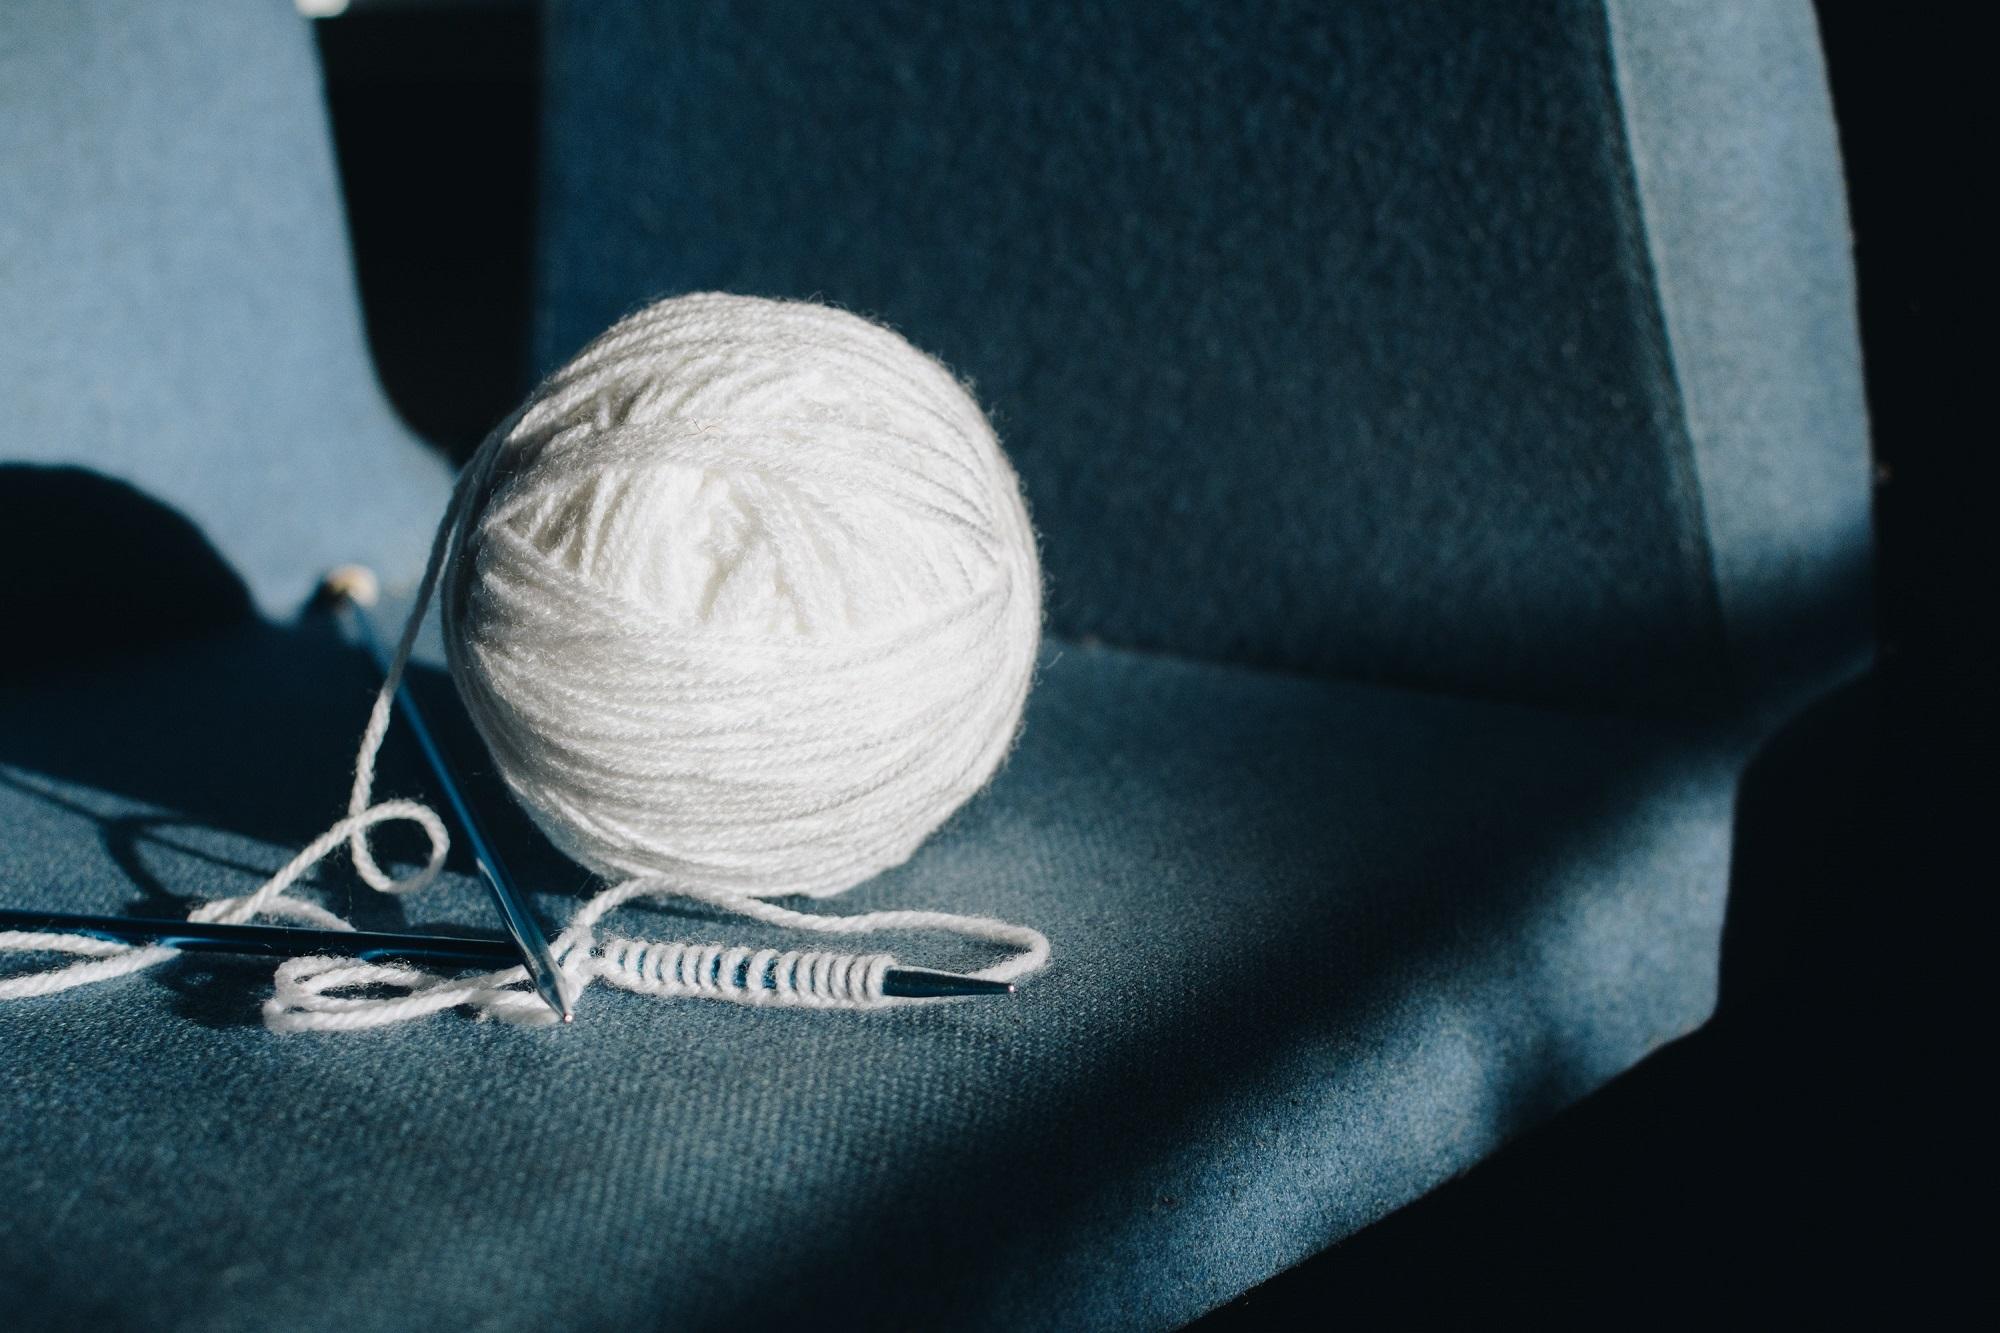 Knitting: Sock Knitting for Beginners - 2 Night : Susan